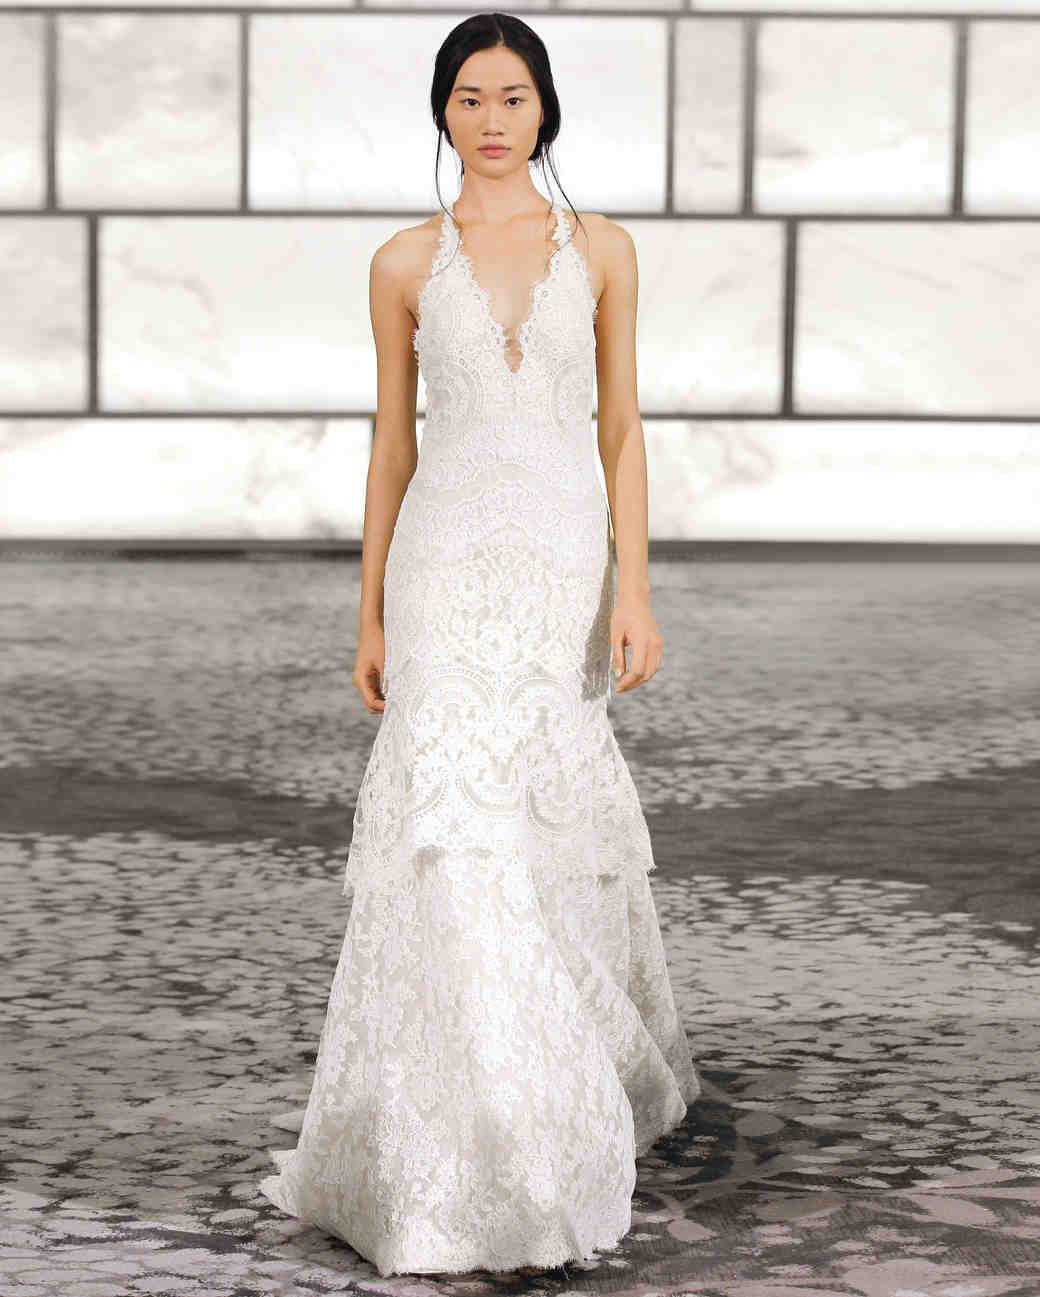 50-states-wedding-dresses-wyoming-rivini-fall2015-wd111643-013-0615.jpg